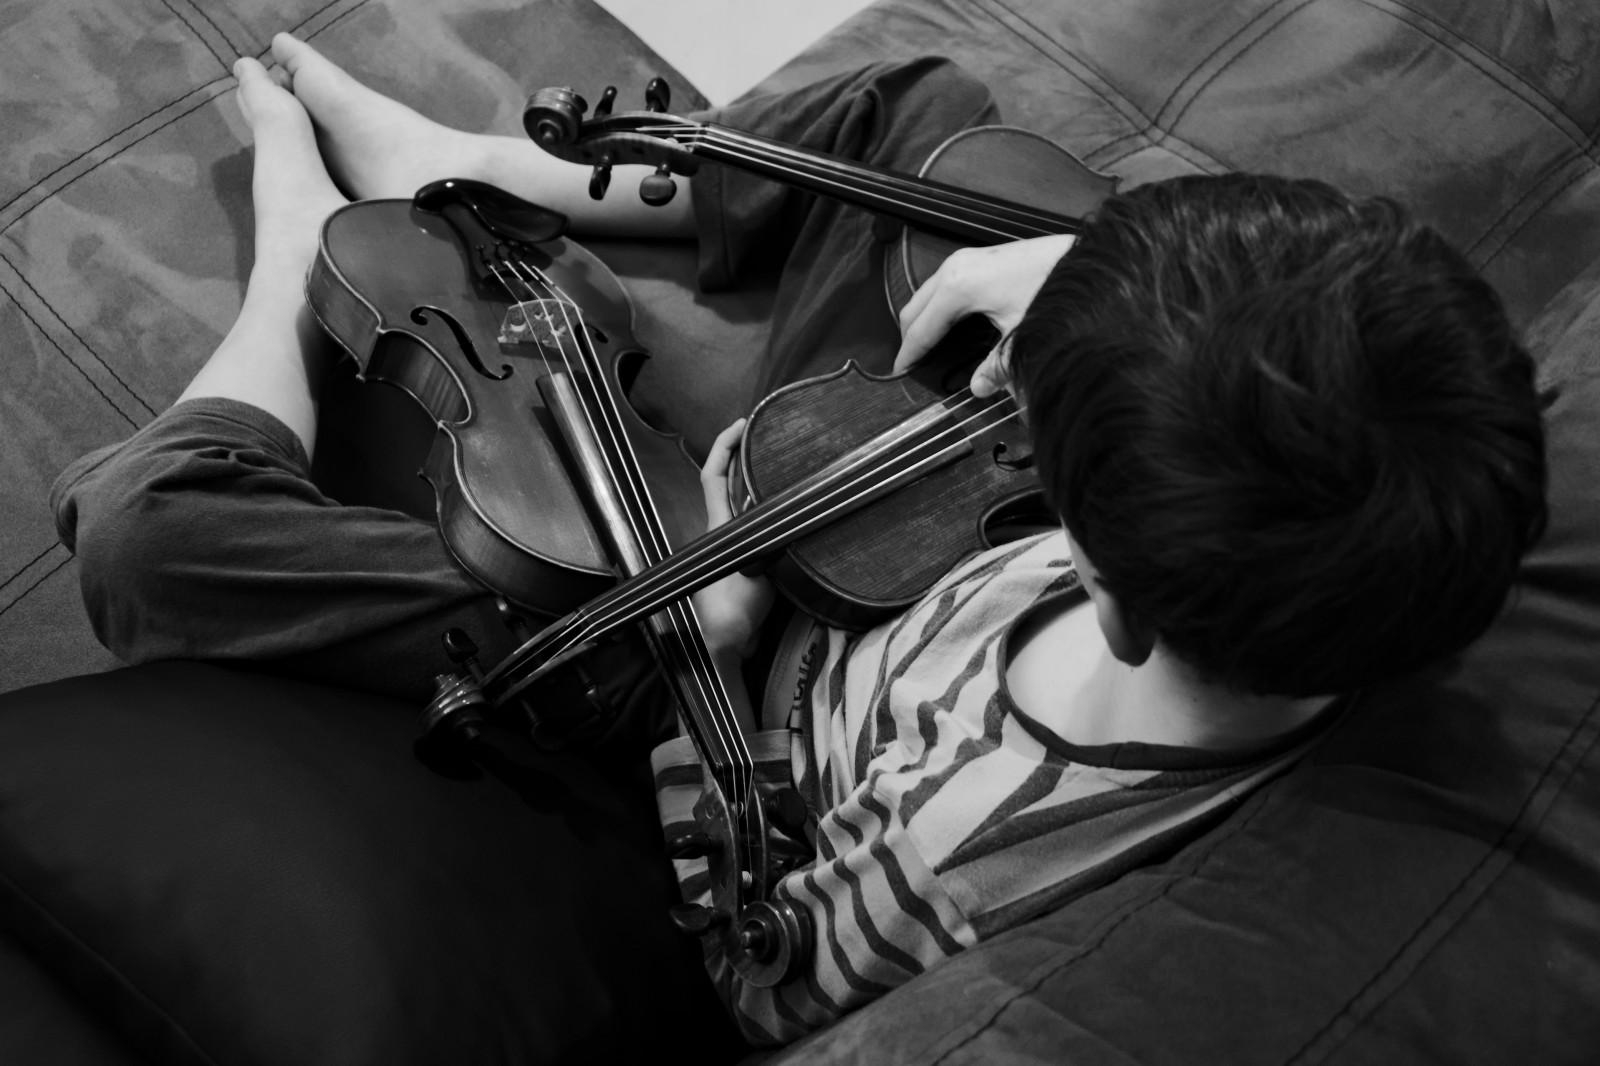 Sfondi Monocromo Bambini Strumento Musicale Musicista Sony